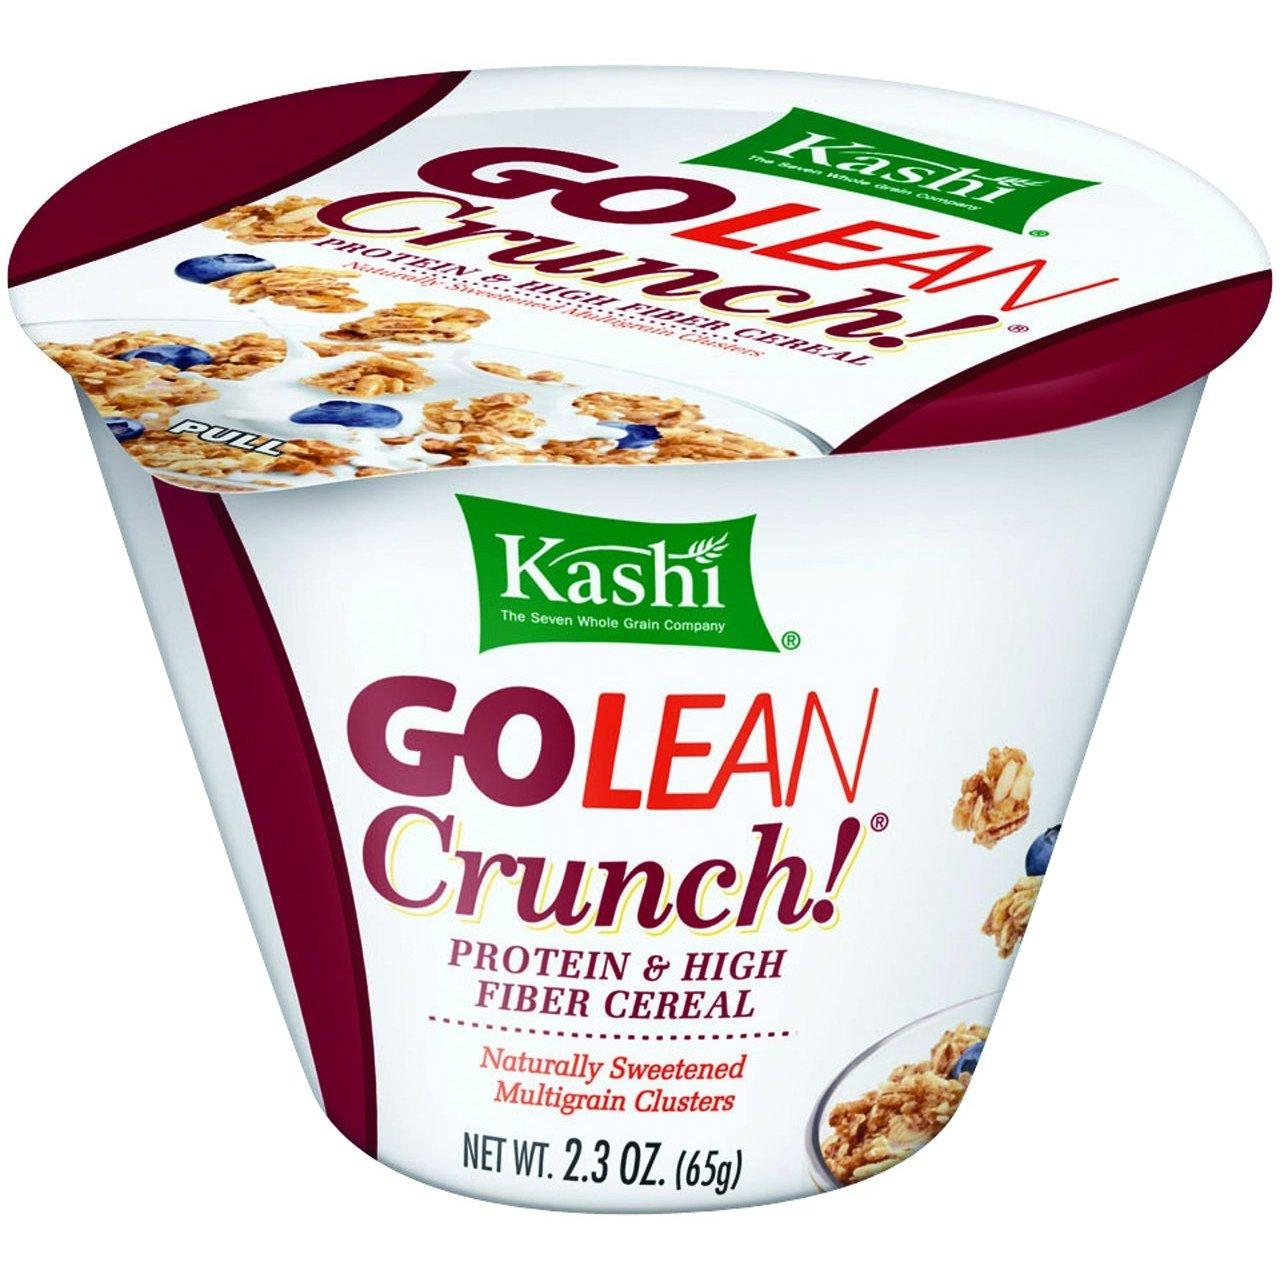 $2.00/2 Kashi Cereal Printable Coupon (No Size Restriction